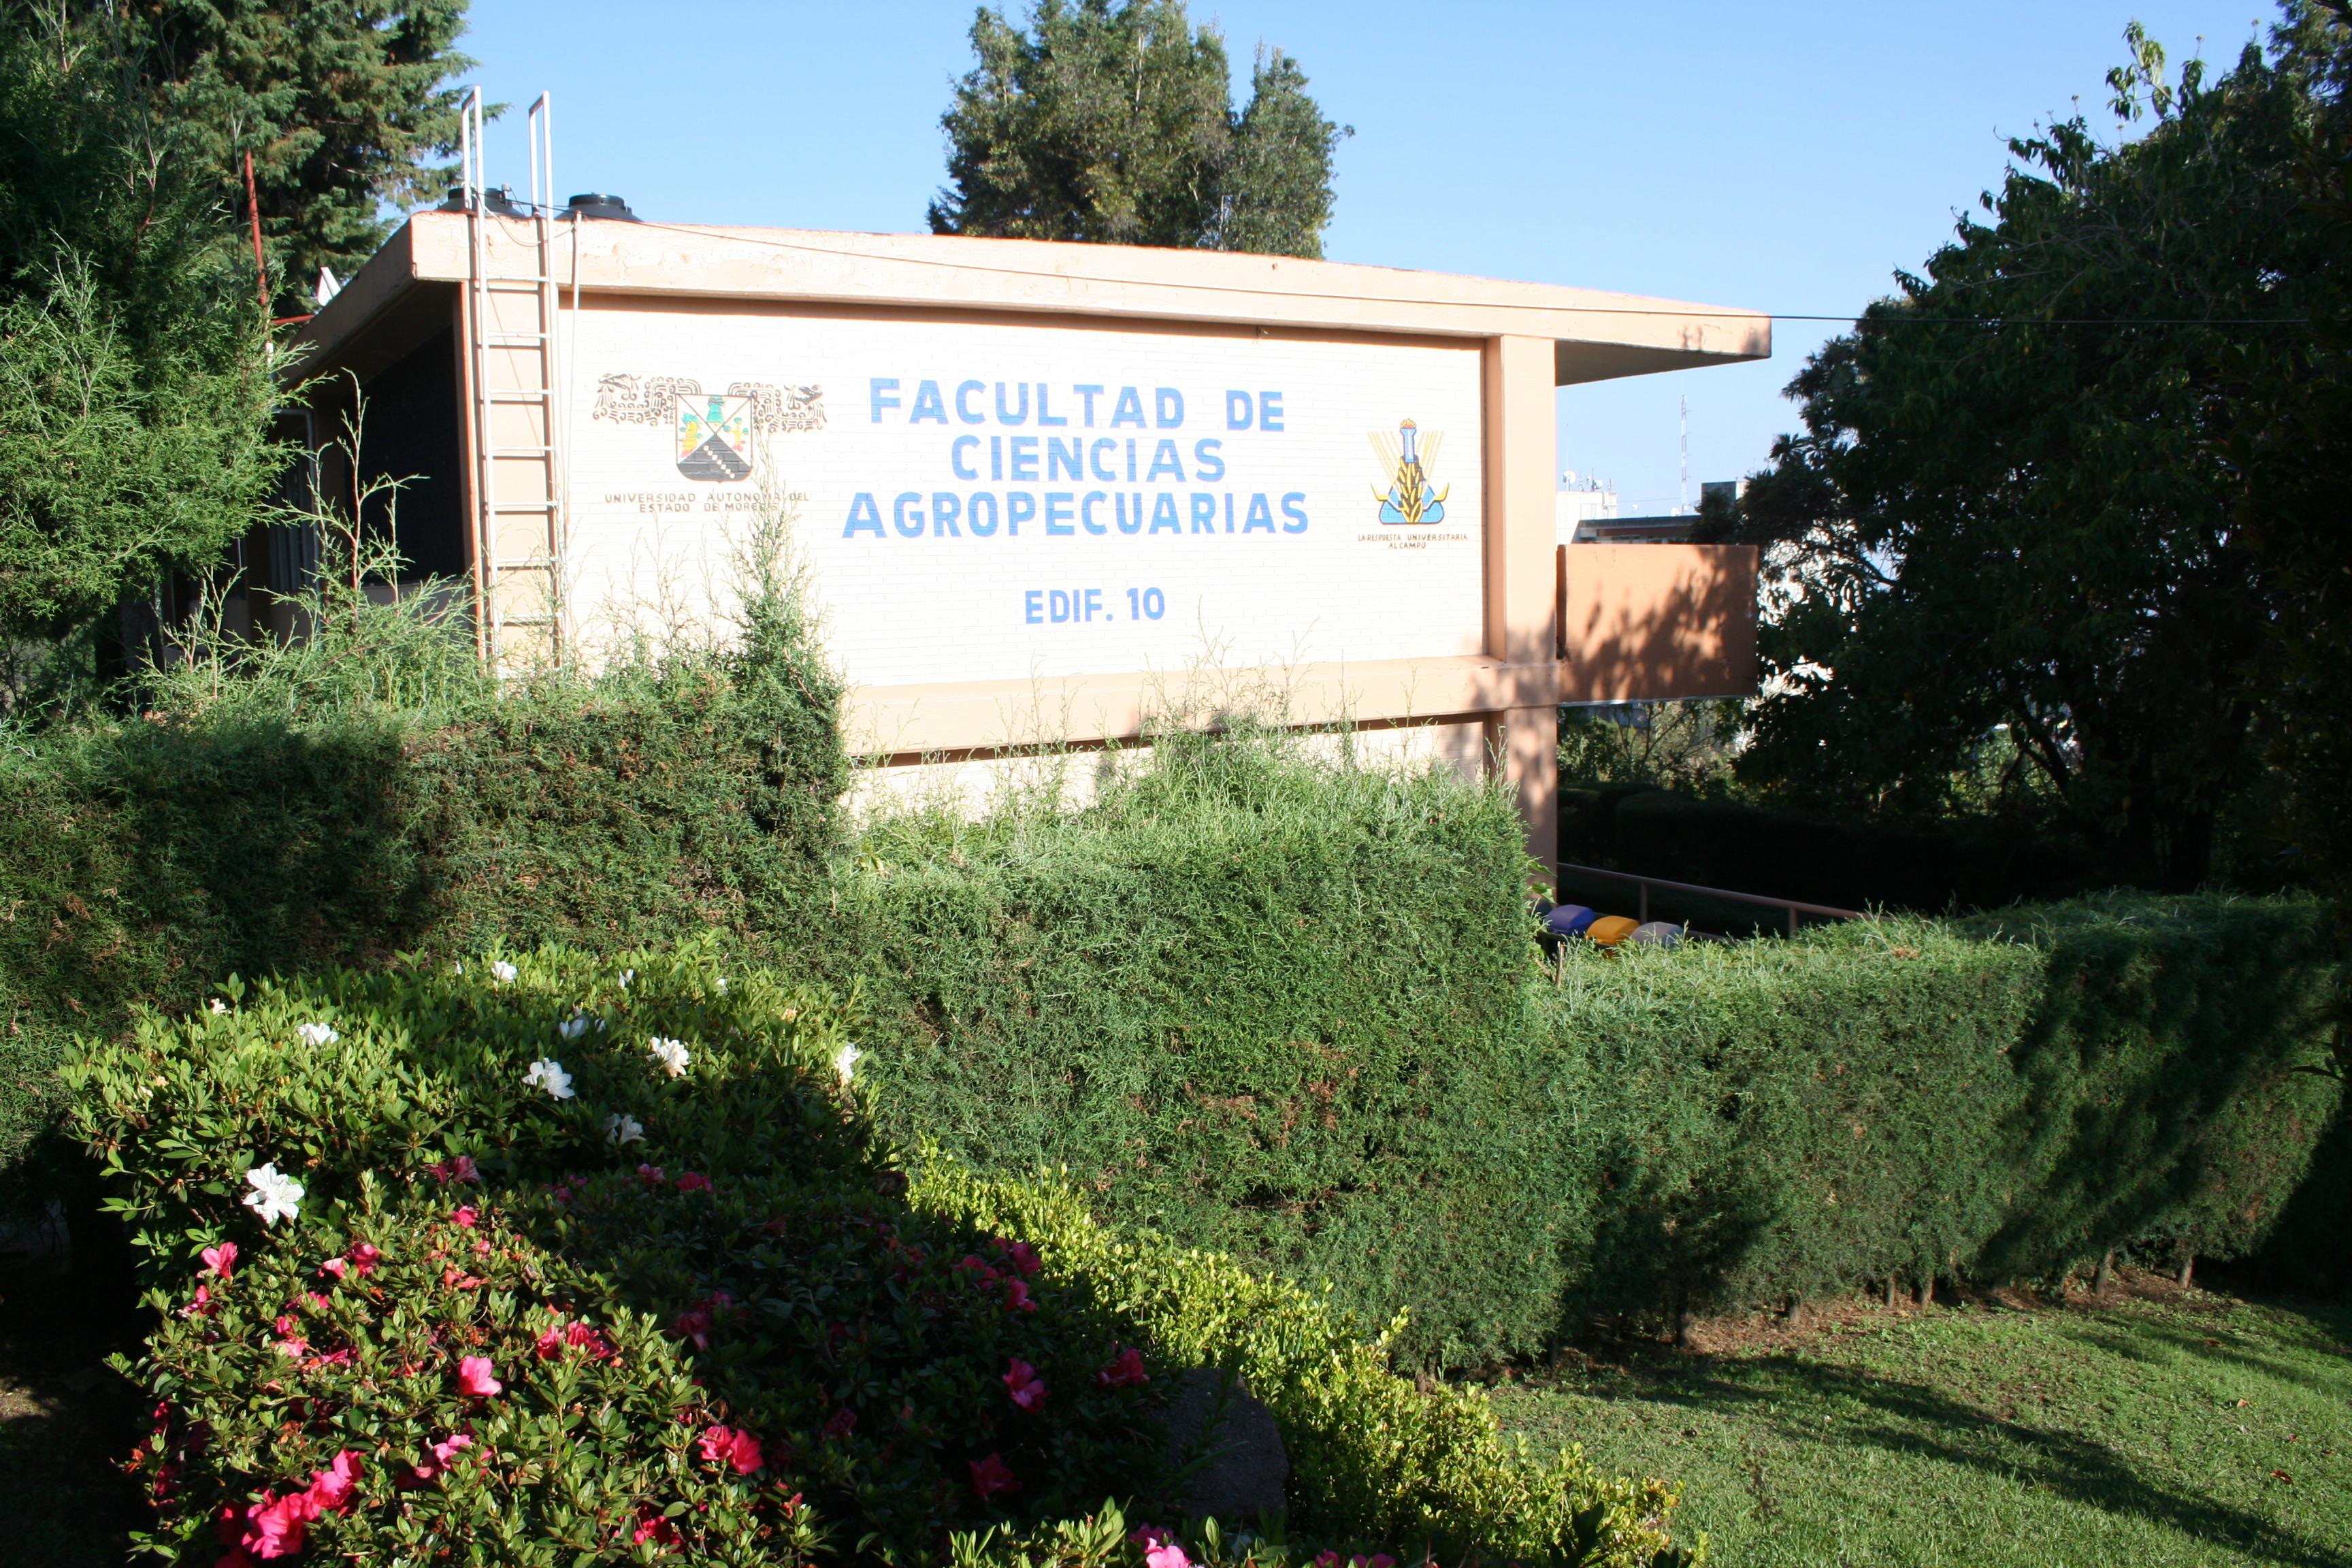 Facultad de ciencias agropecuarias- UAEM